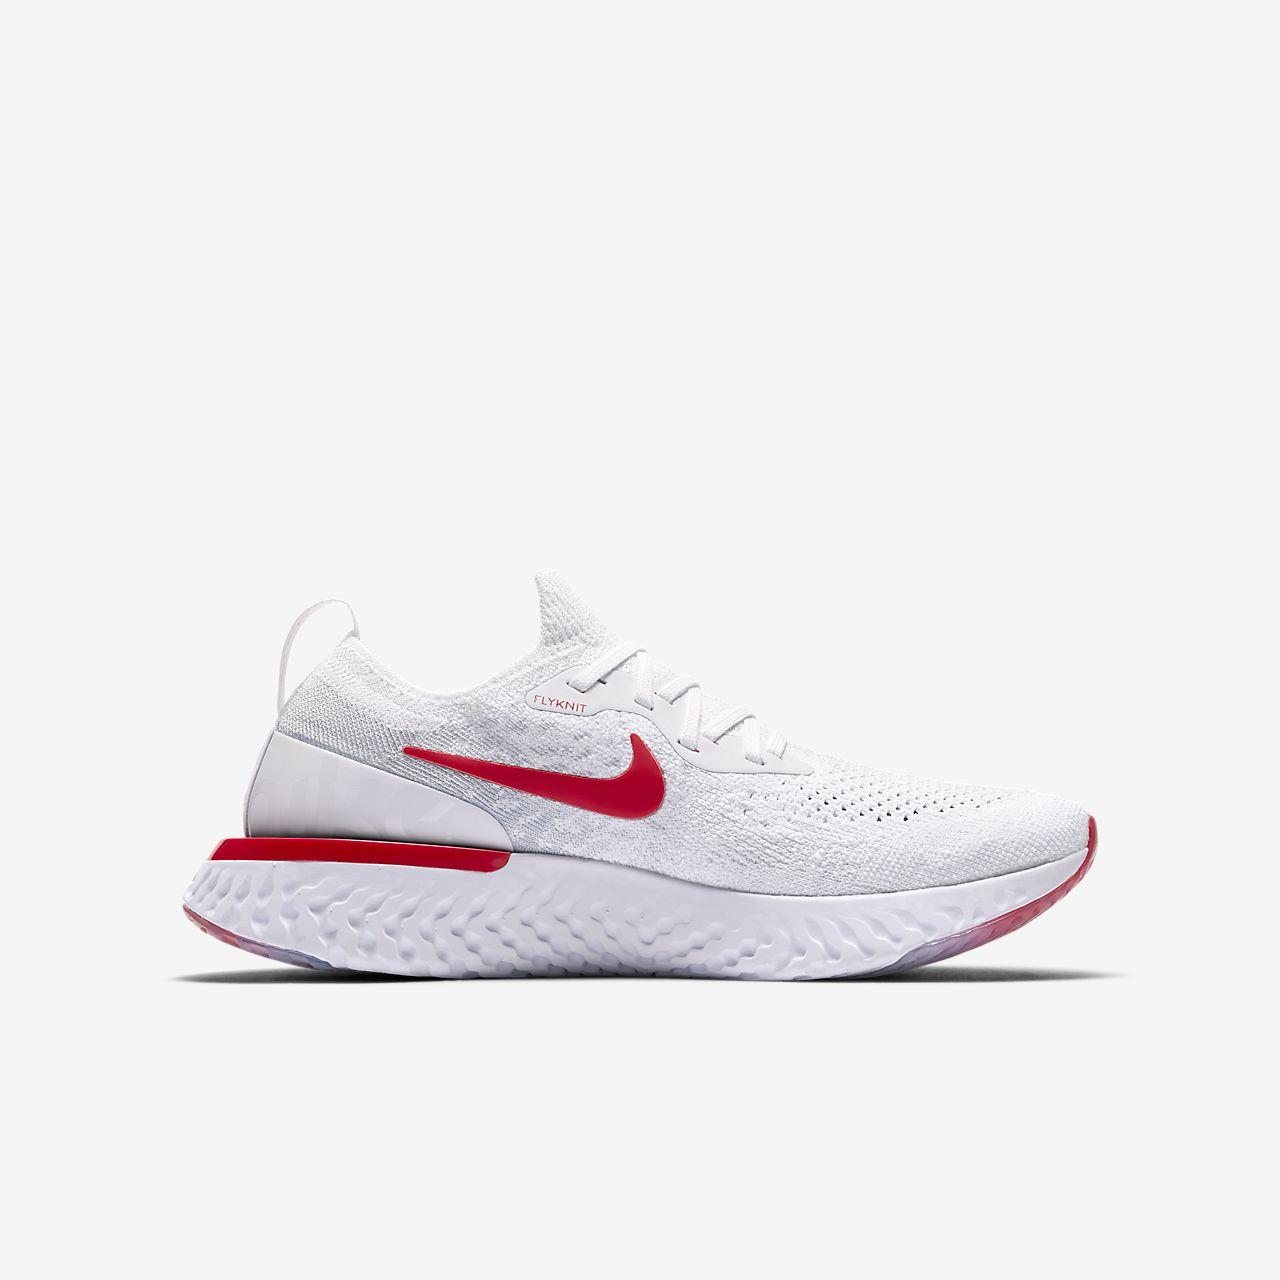 Nike Epic Reaccionar Rojo Blanco aclaramiento de china FXBihLZhxd